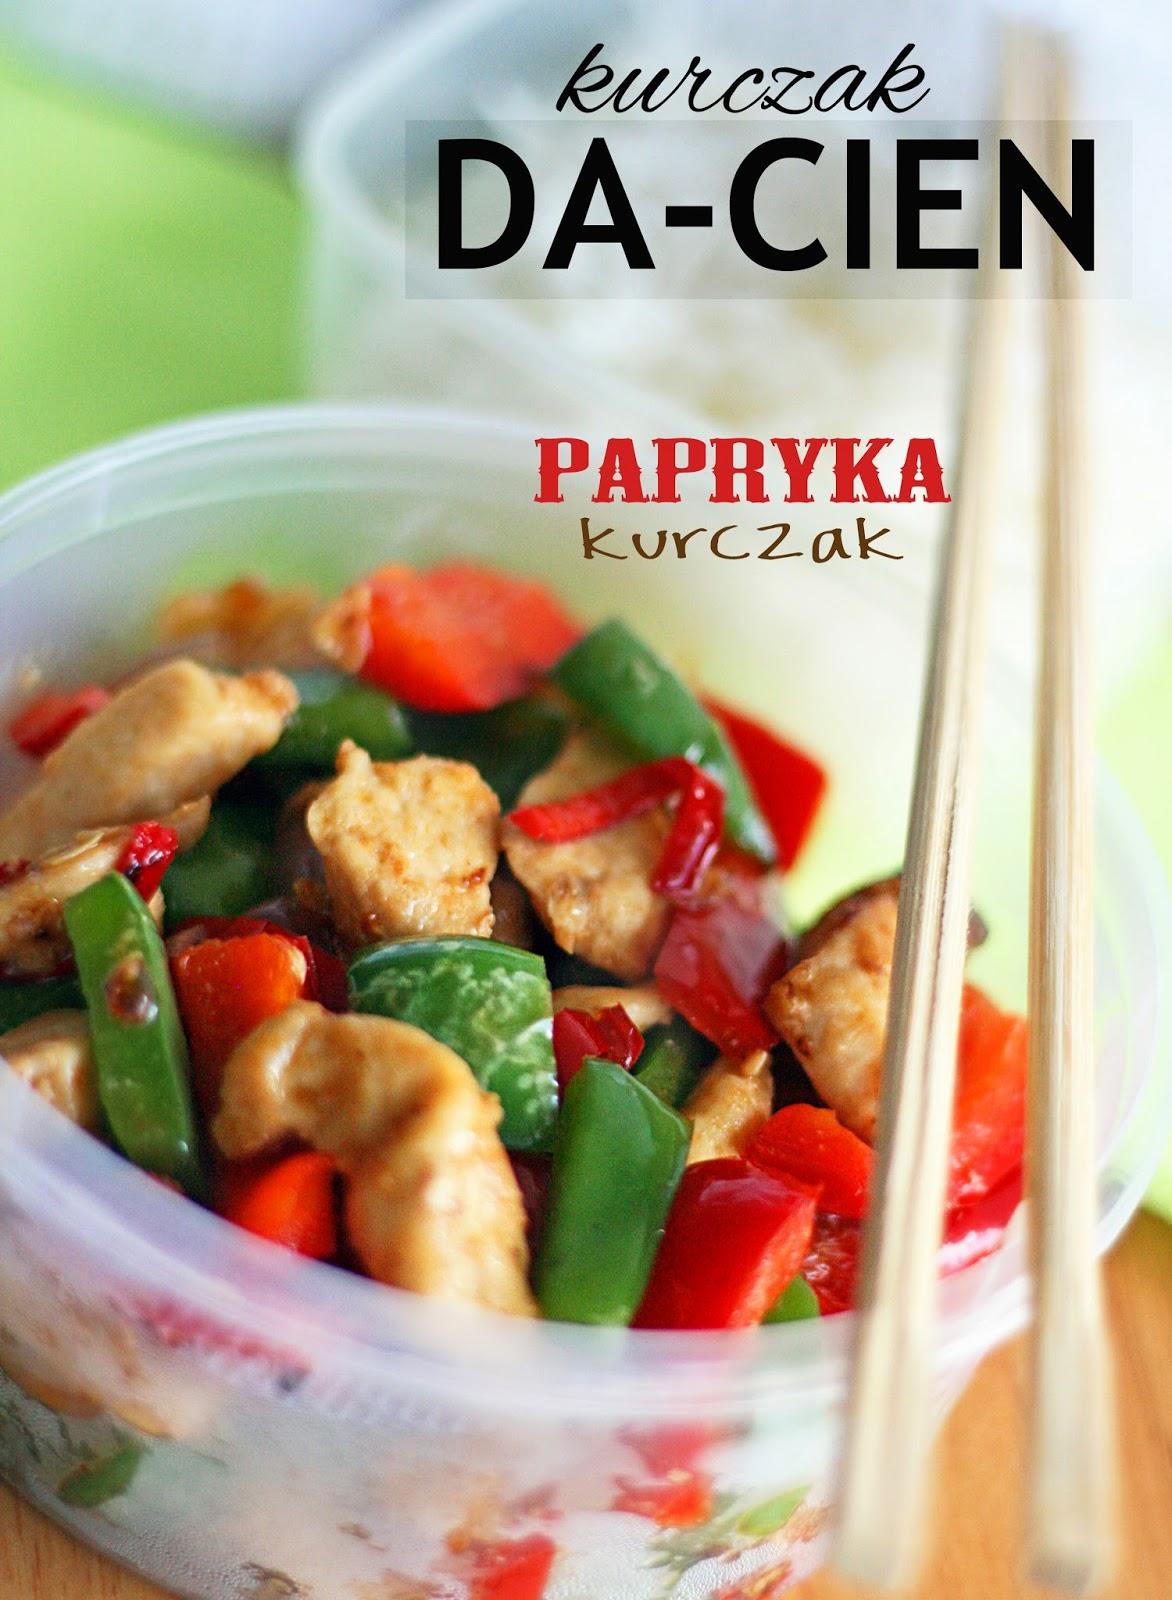 So Sweet So Spicy Kuchnia Chińska Kurczak Da Cien